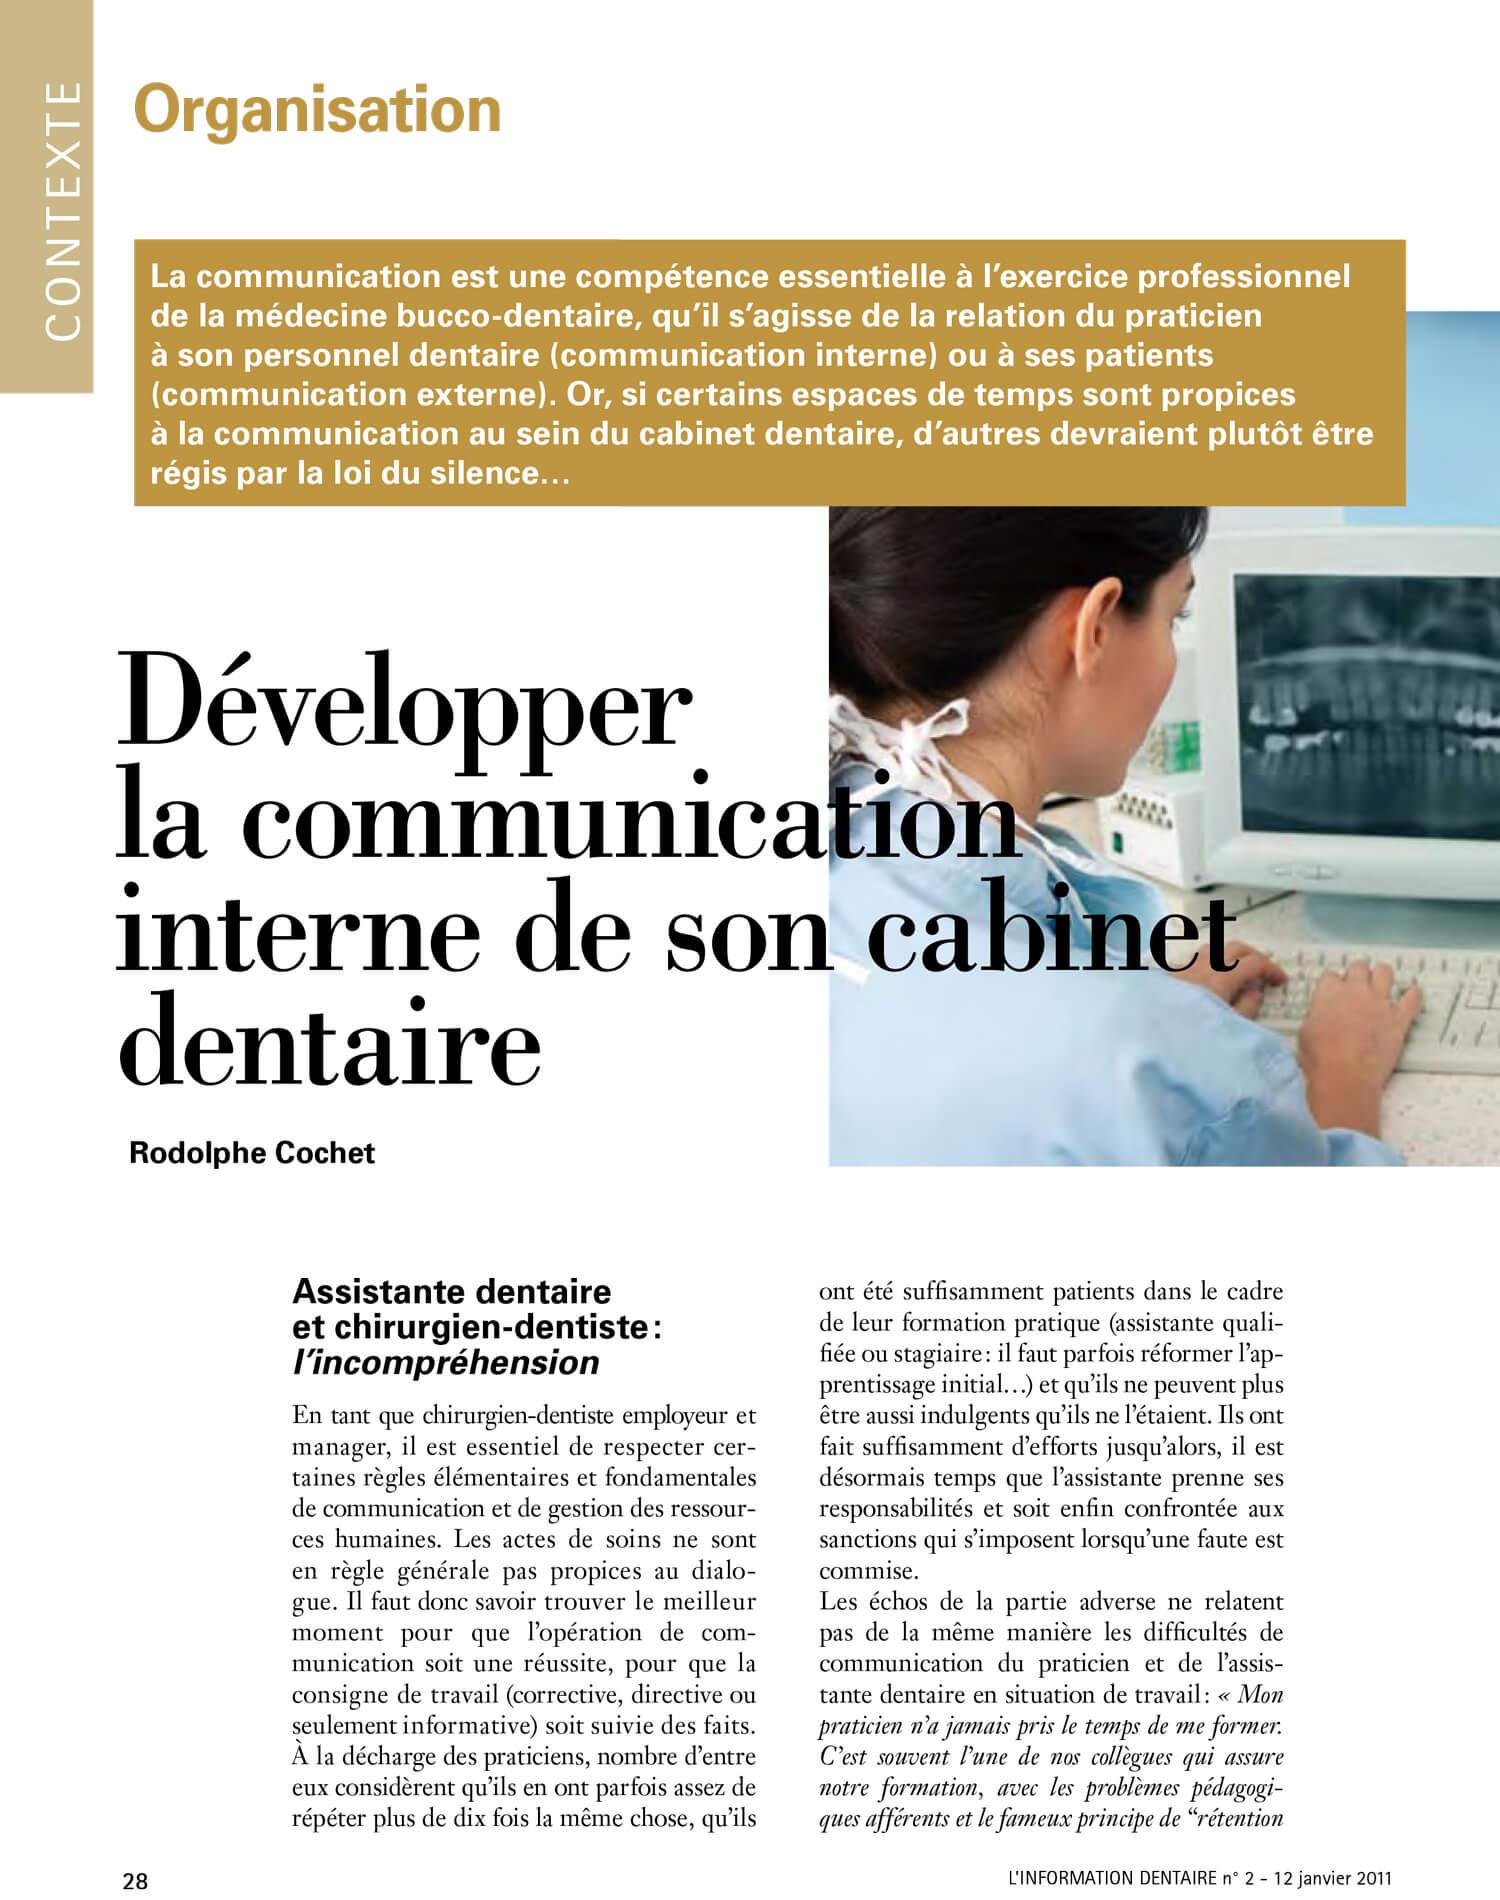 developper-communication-interne-gestion-cabinet-dentaire-Rodolphe-Cochet.jpg